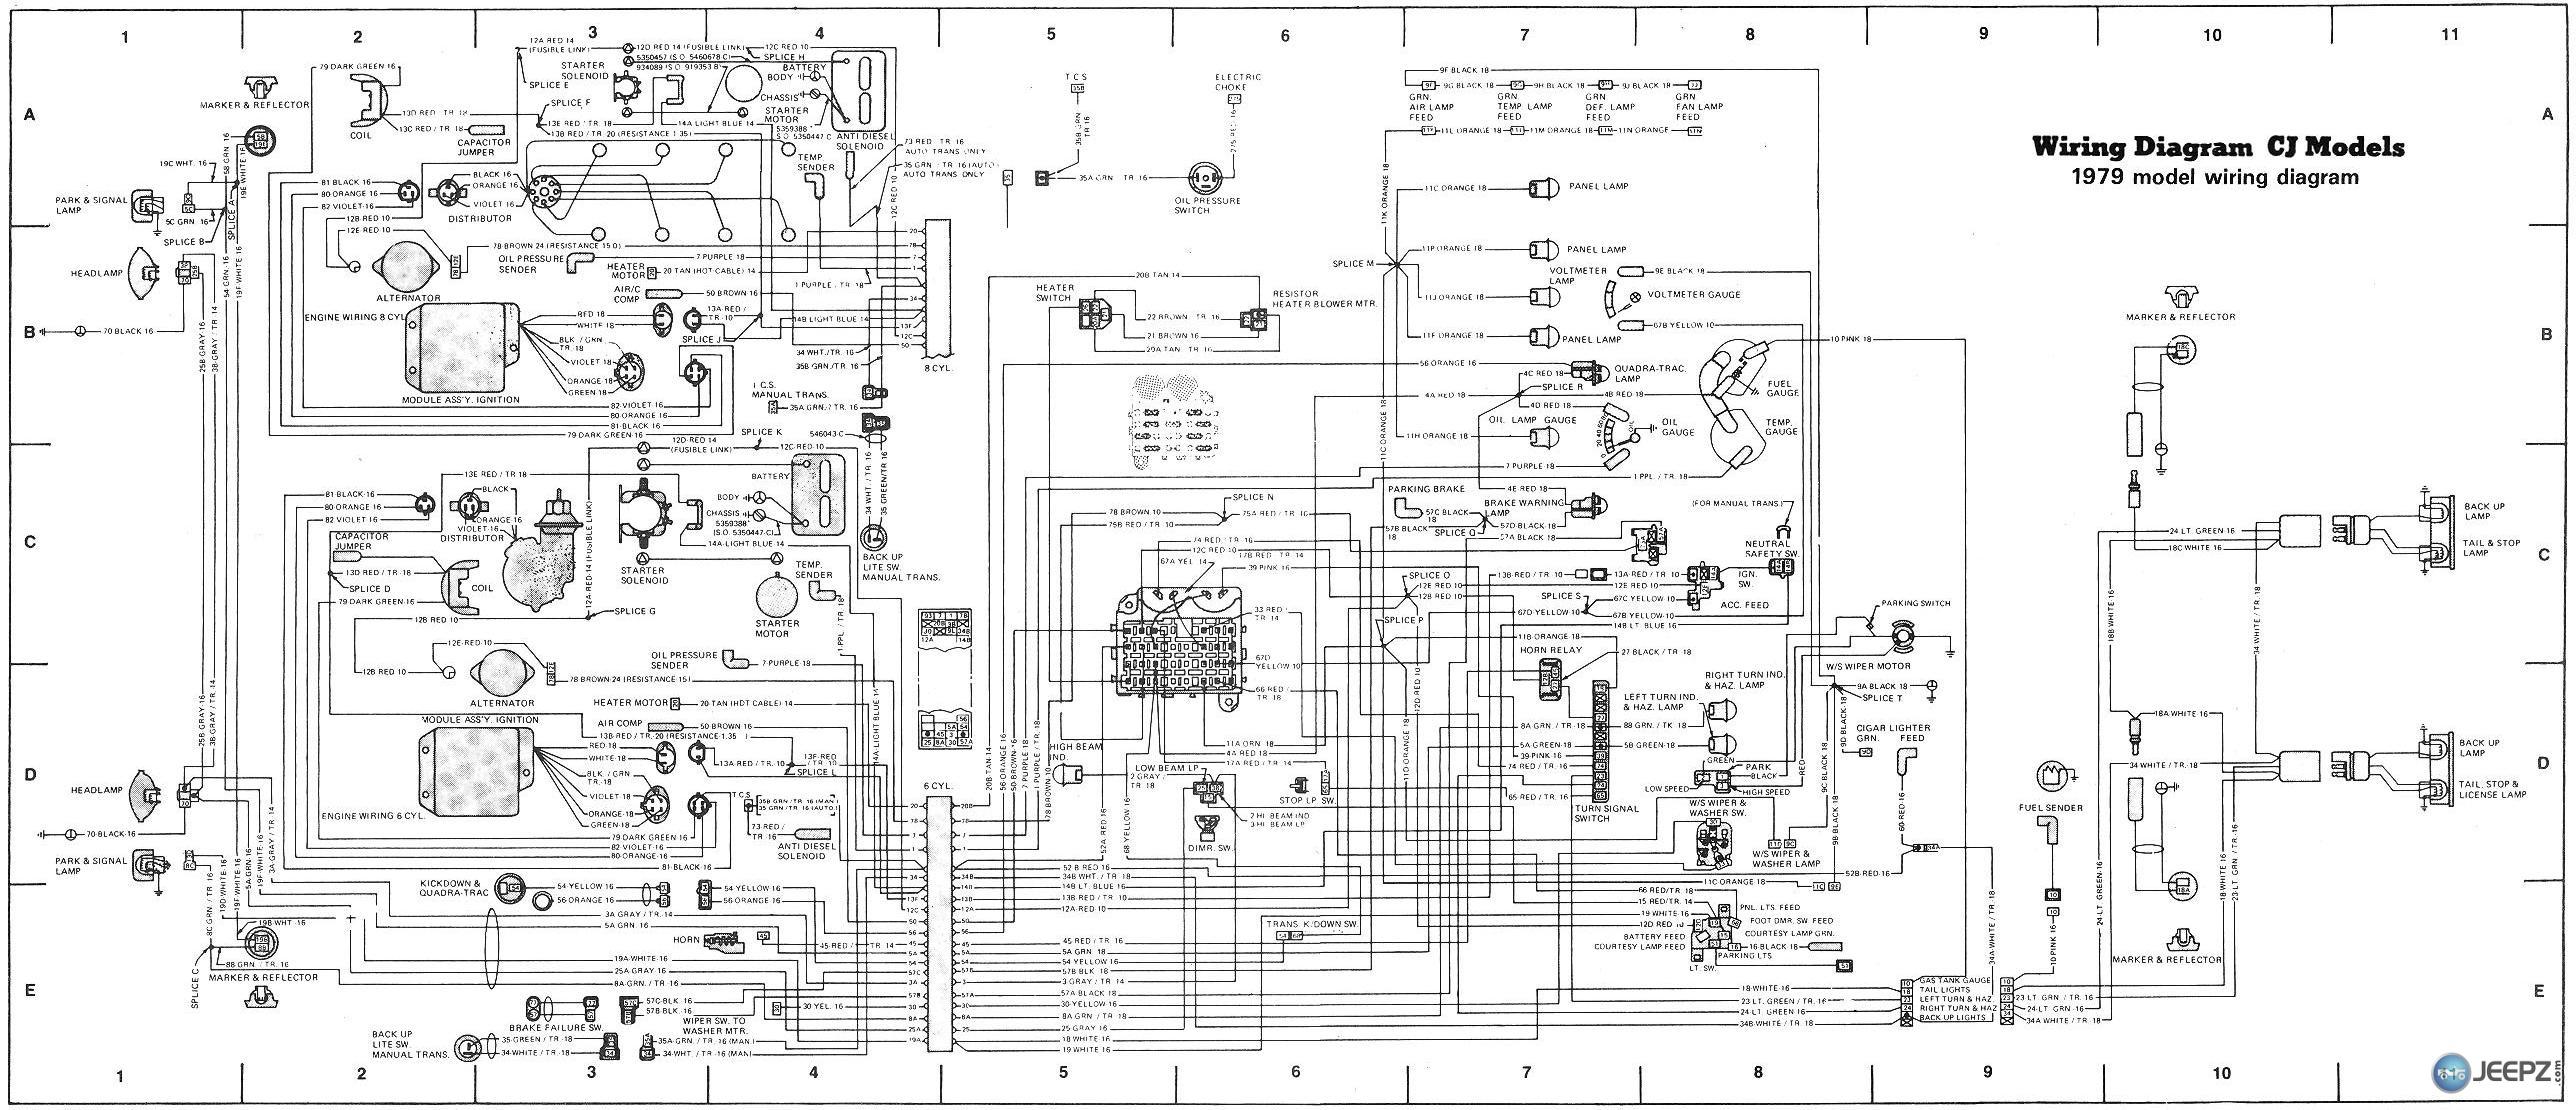 1984 Jeep Cj7 Fuse Diagram Detailed Schematics Diagram 1984 Jeep CJ7 Wiring-Diagram  Wiring Diagrams For 1985 Jeep Cj7